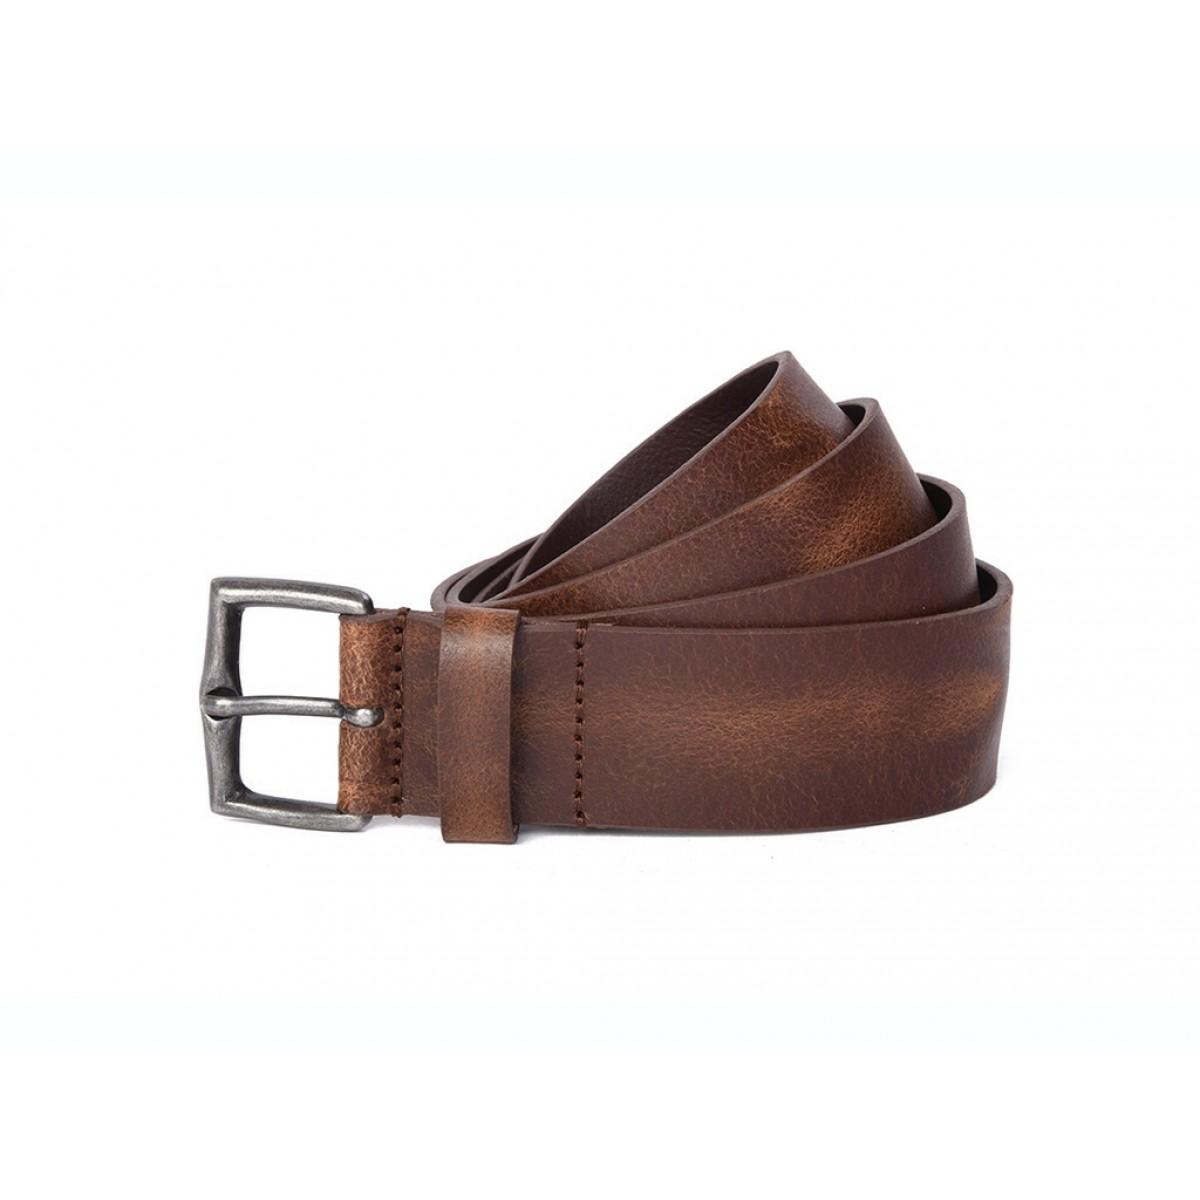 Cintura Diesel - B-rogh cintura trattata